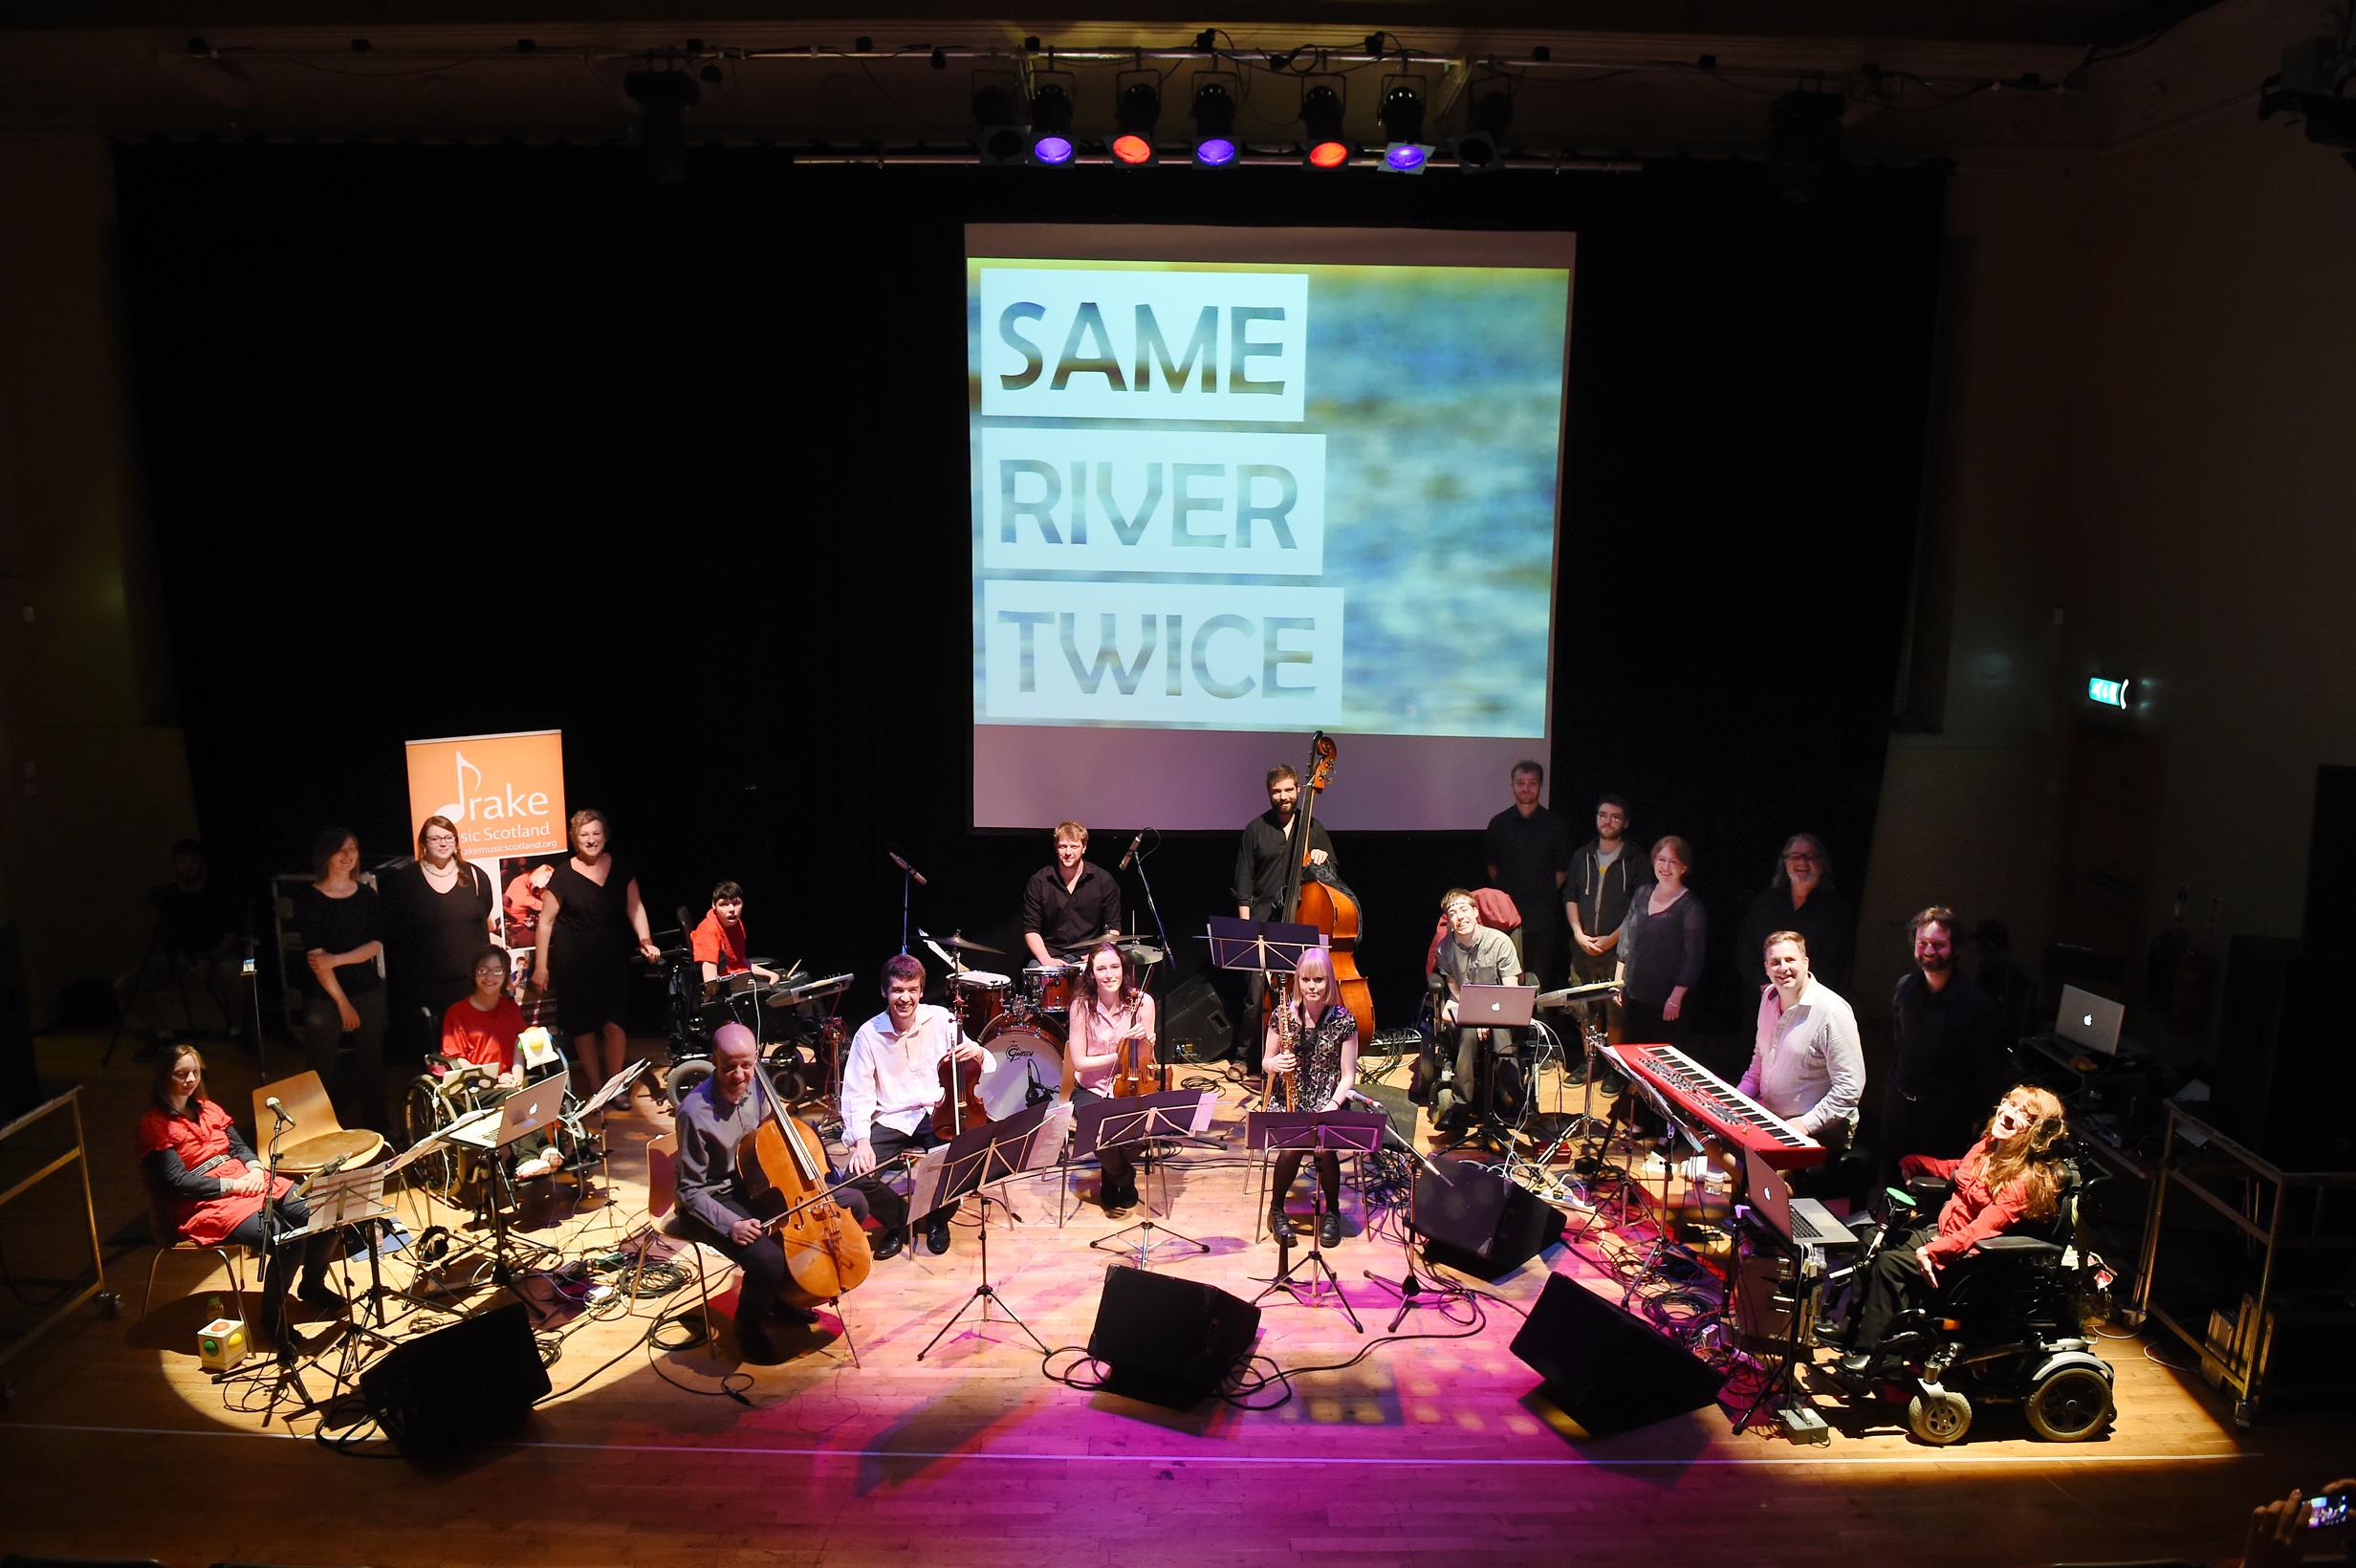 Same-River-Thrice-NYJOS-Drake-Ian-Watson-reduced.jpg